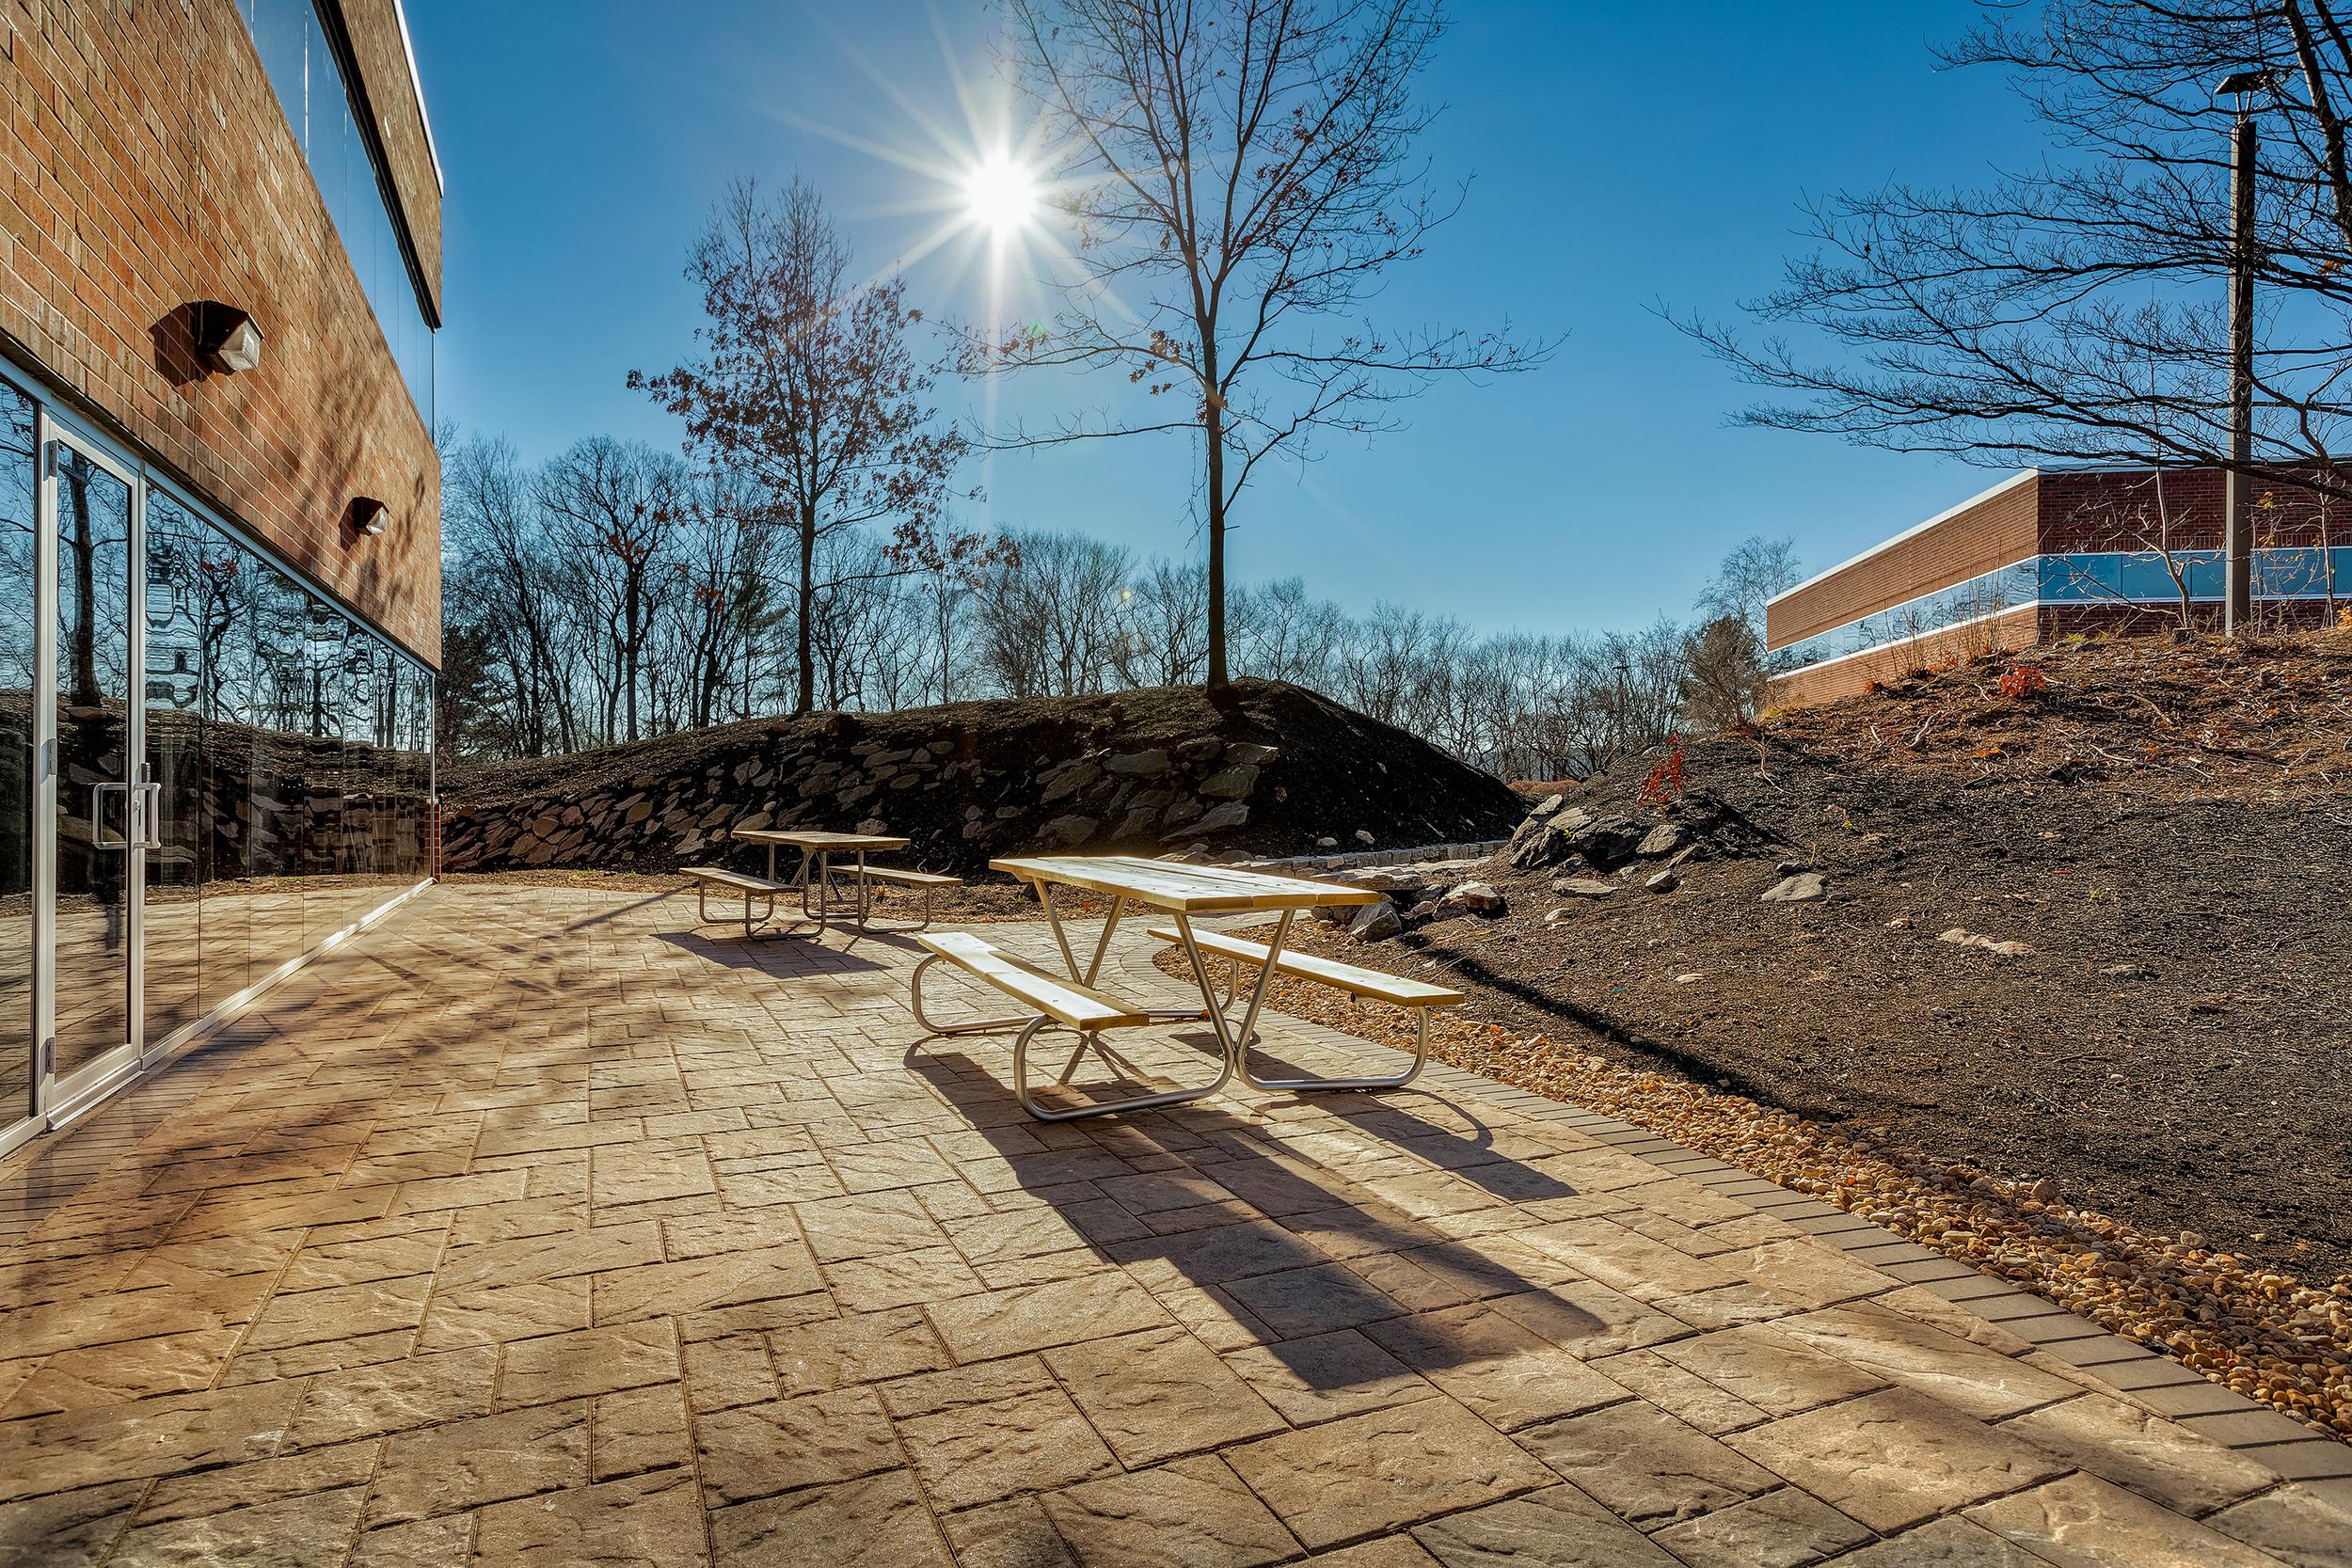 New stone patio for both 1432 & 1440 Main Street tenants to enjoy